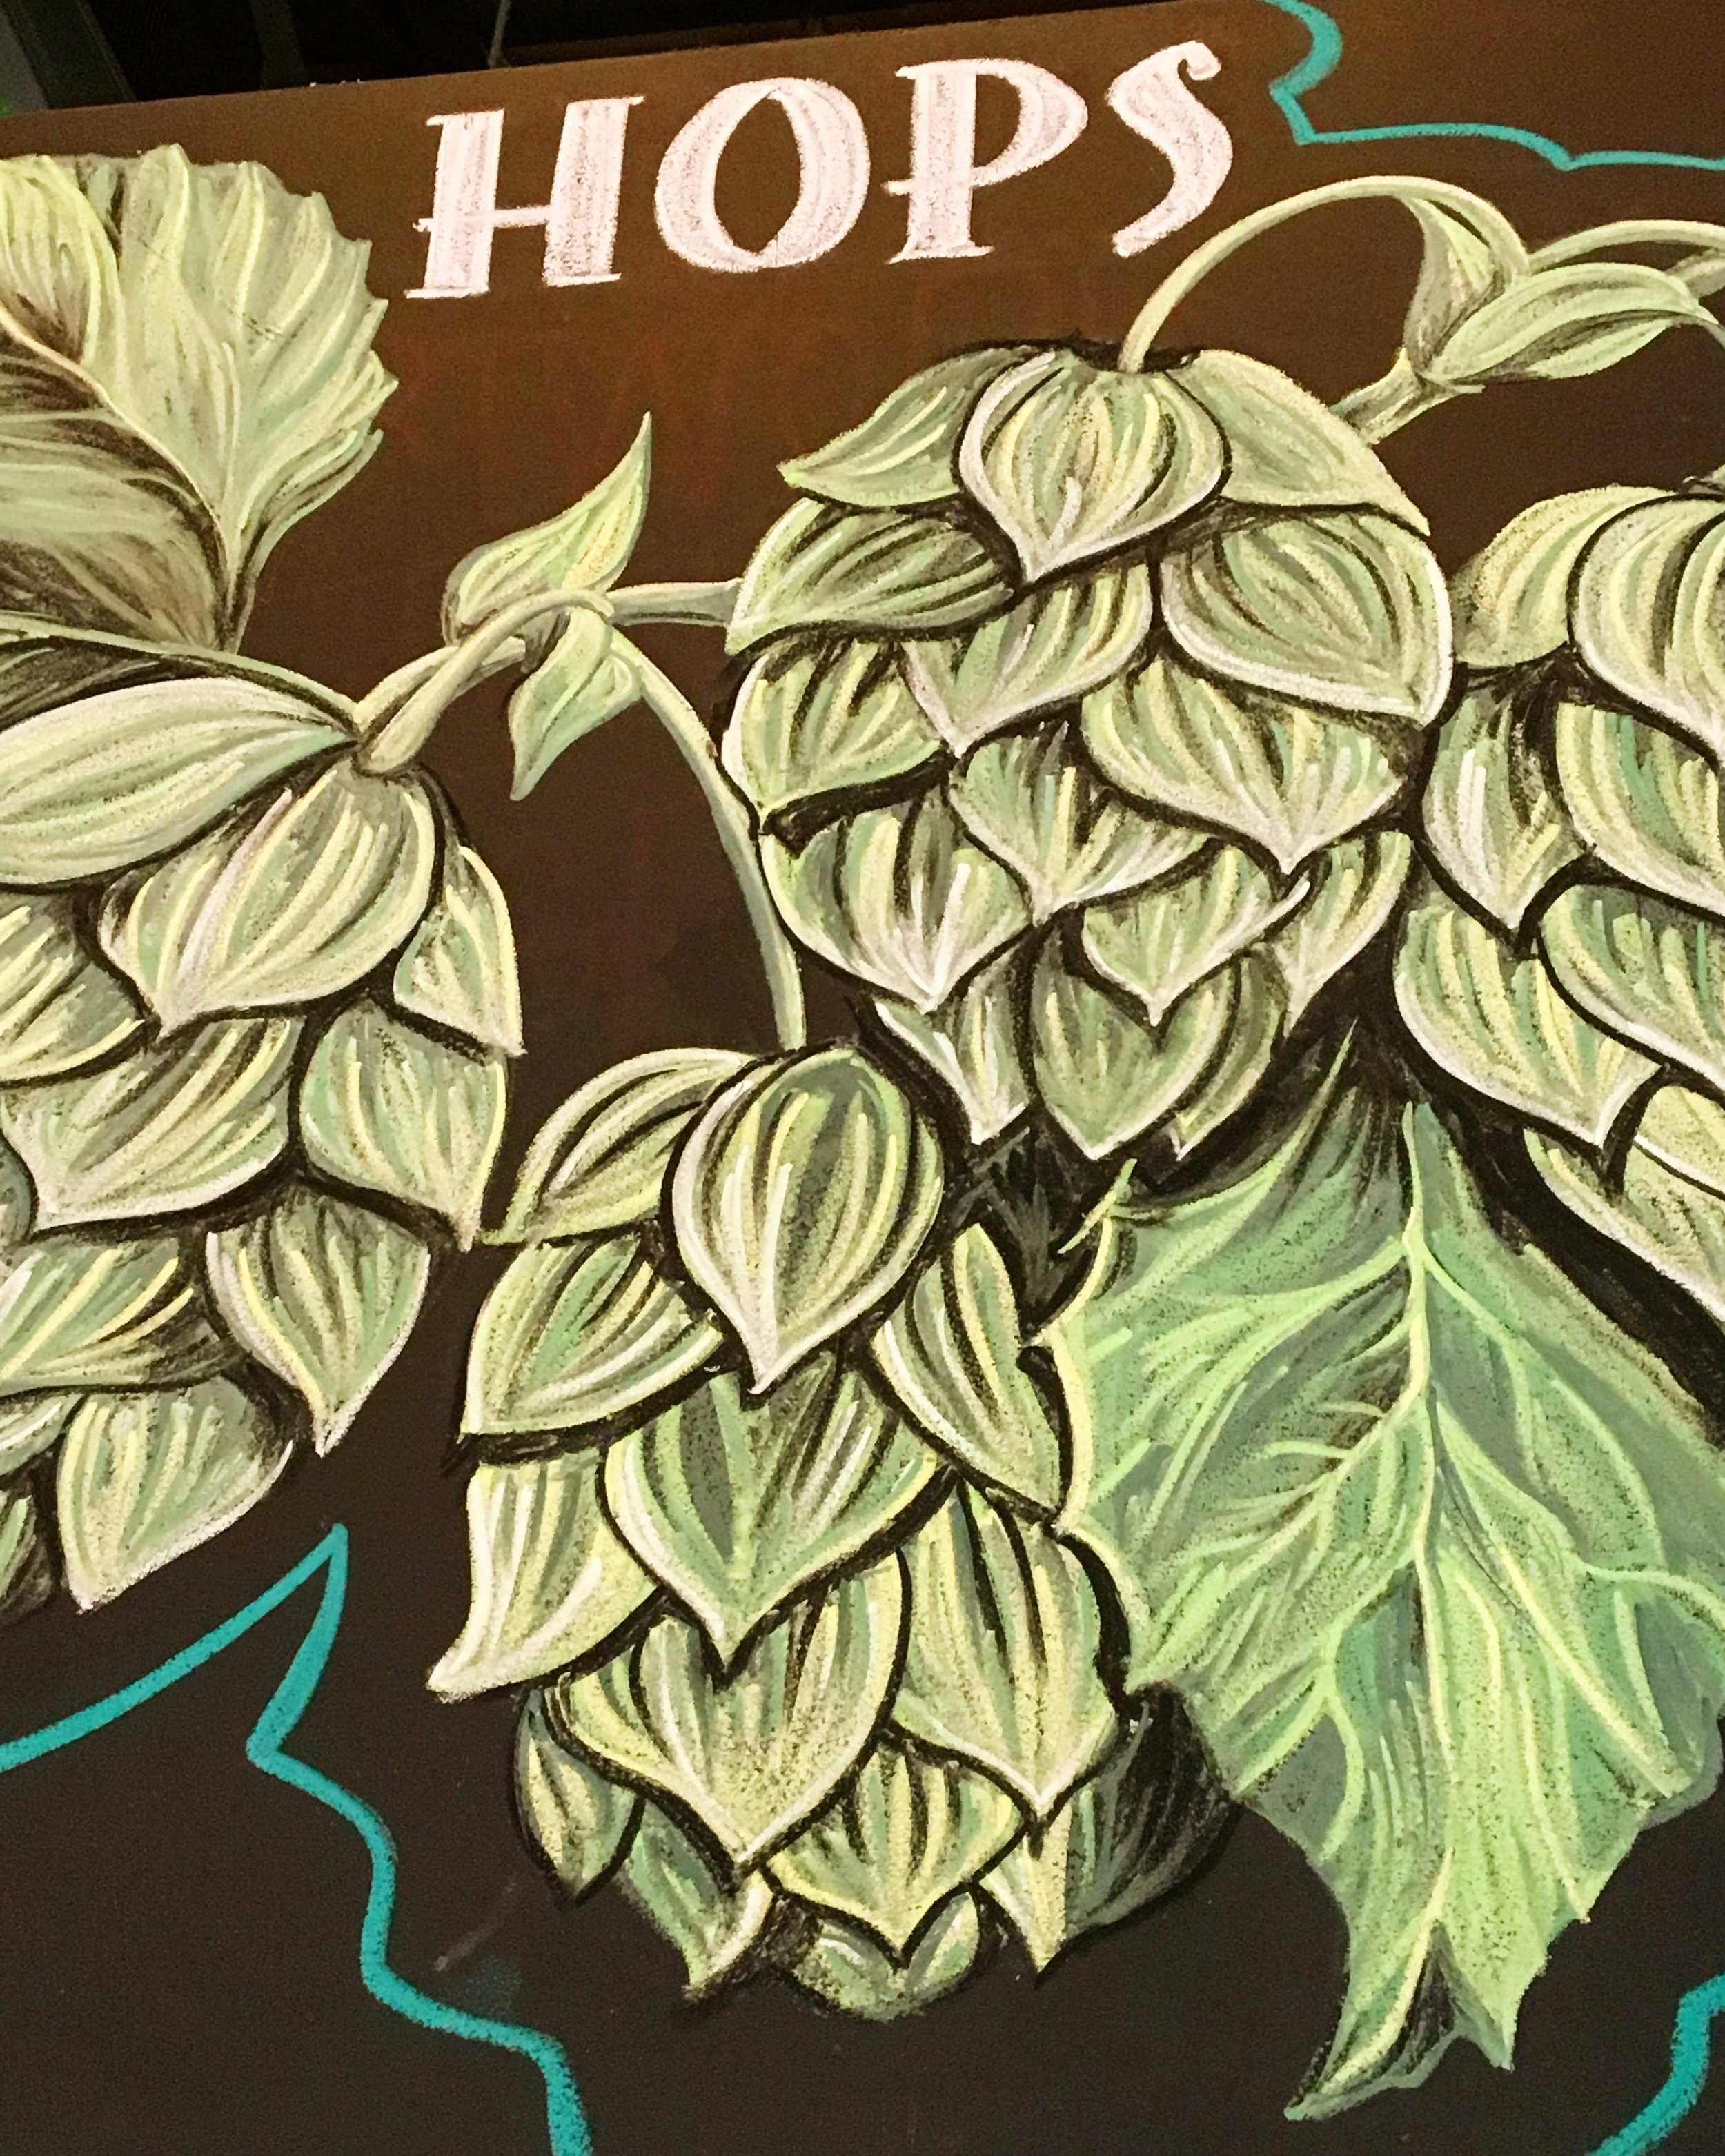 Hops chalk art at Lost Rhino Brewing in Virginia